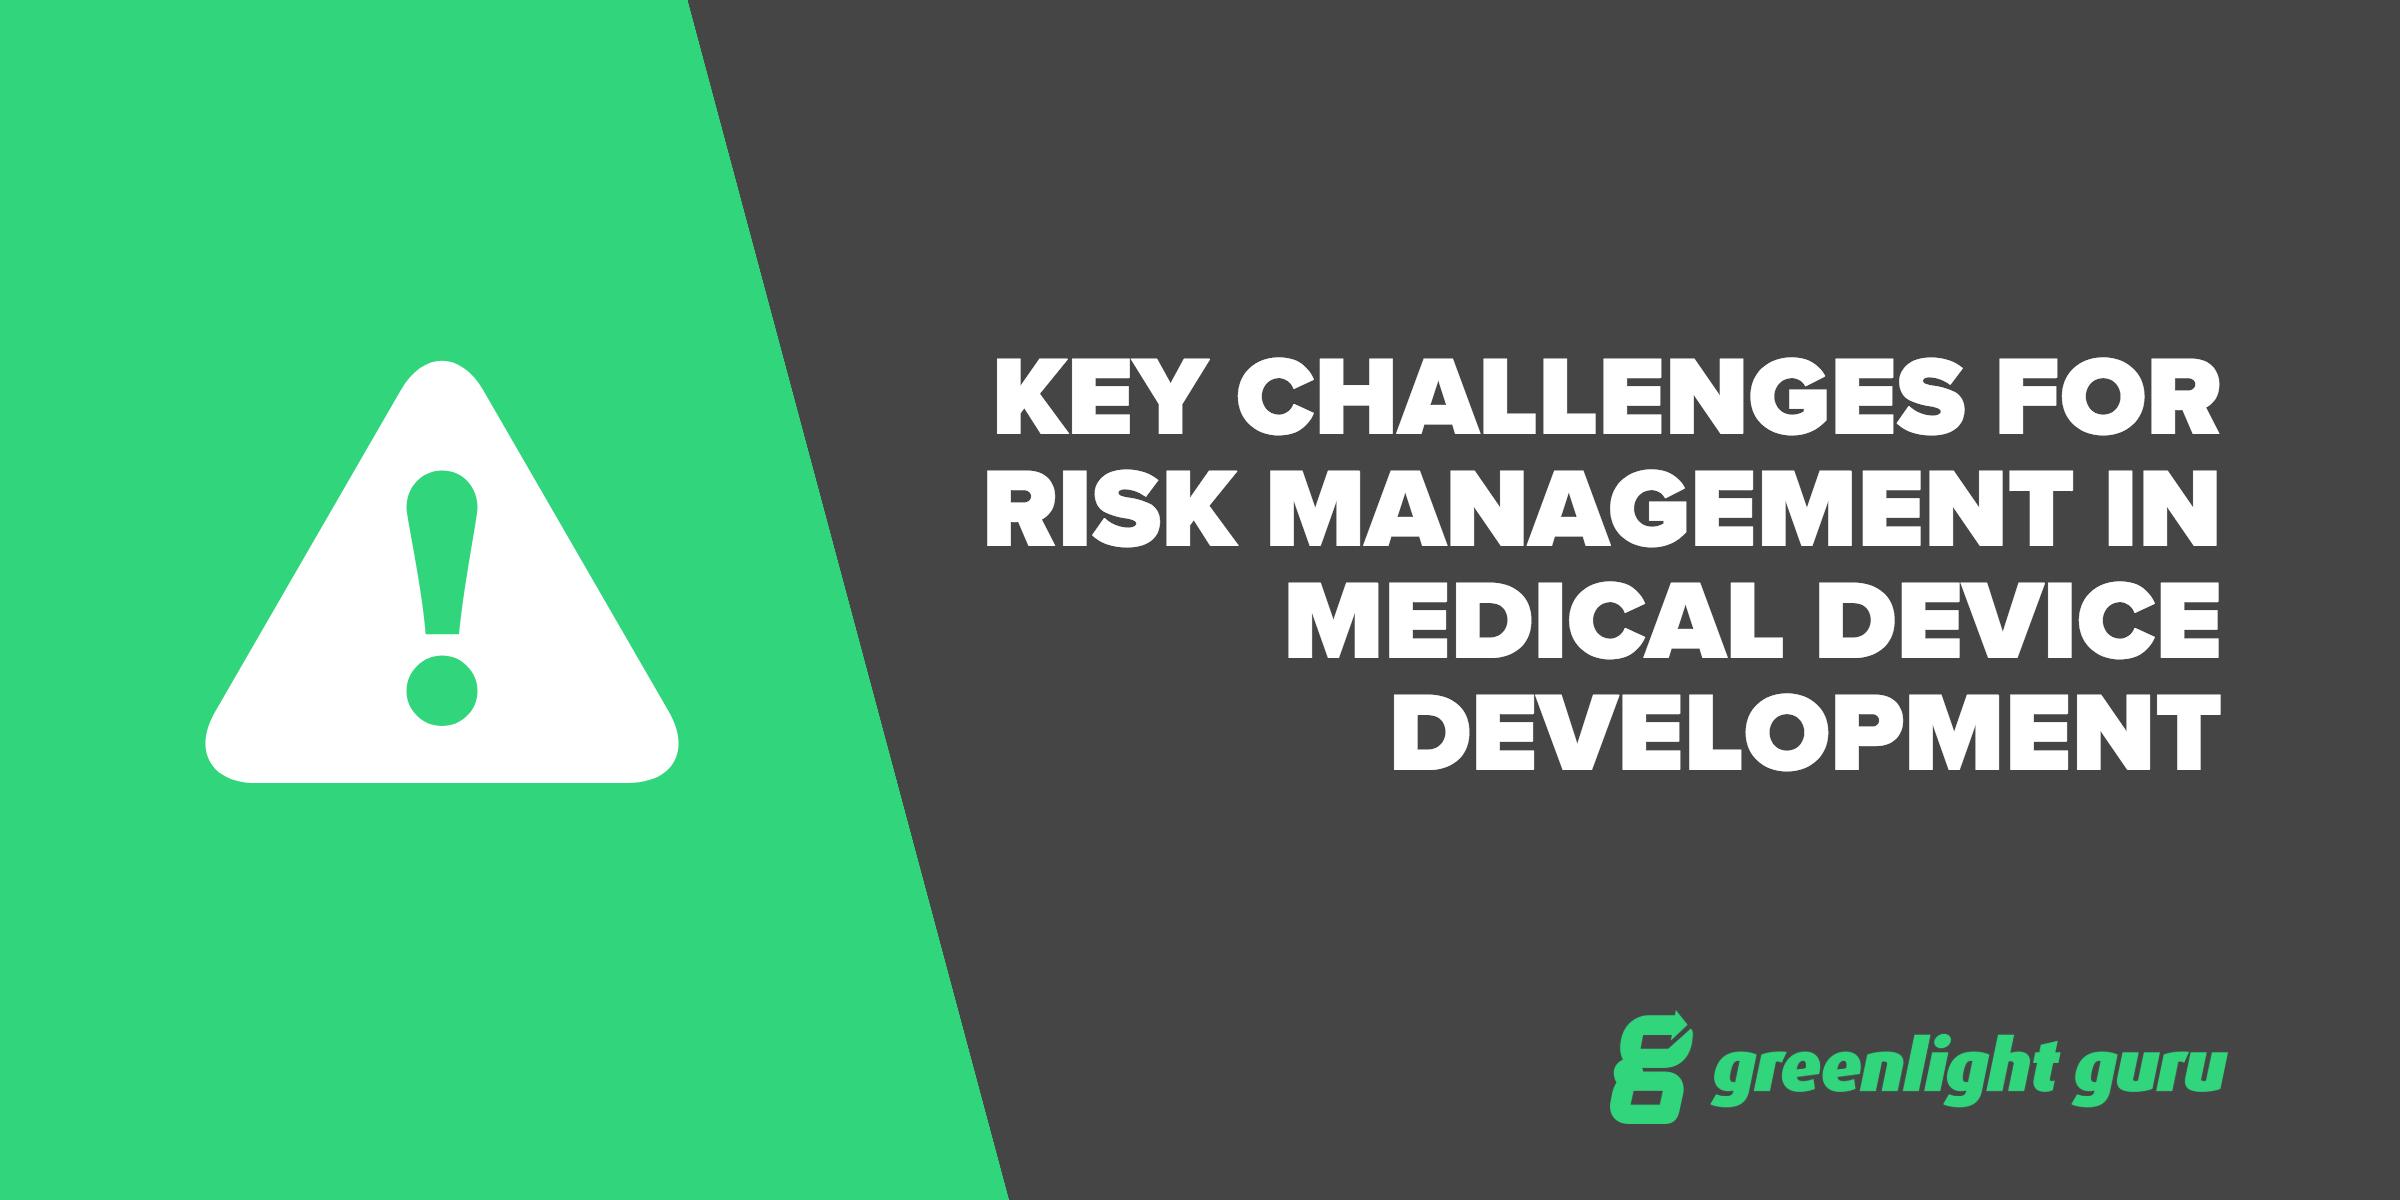 key challenges for risk